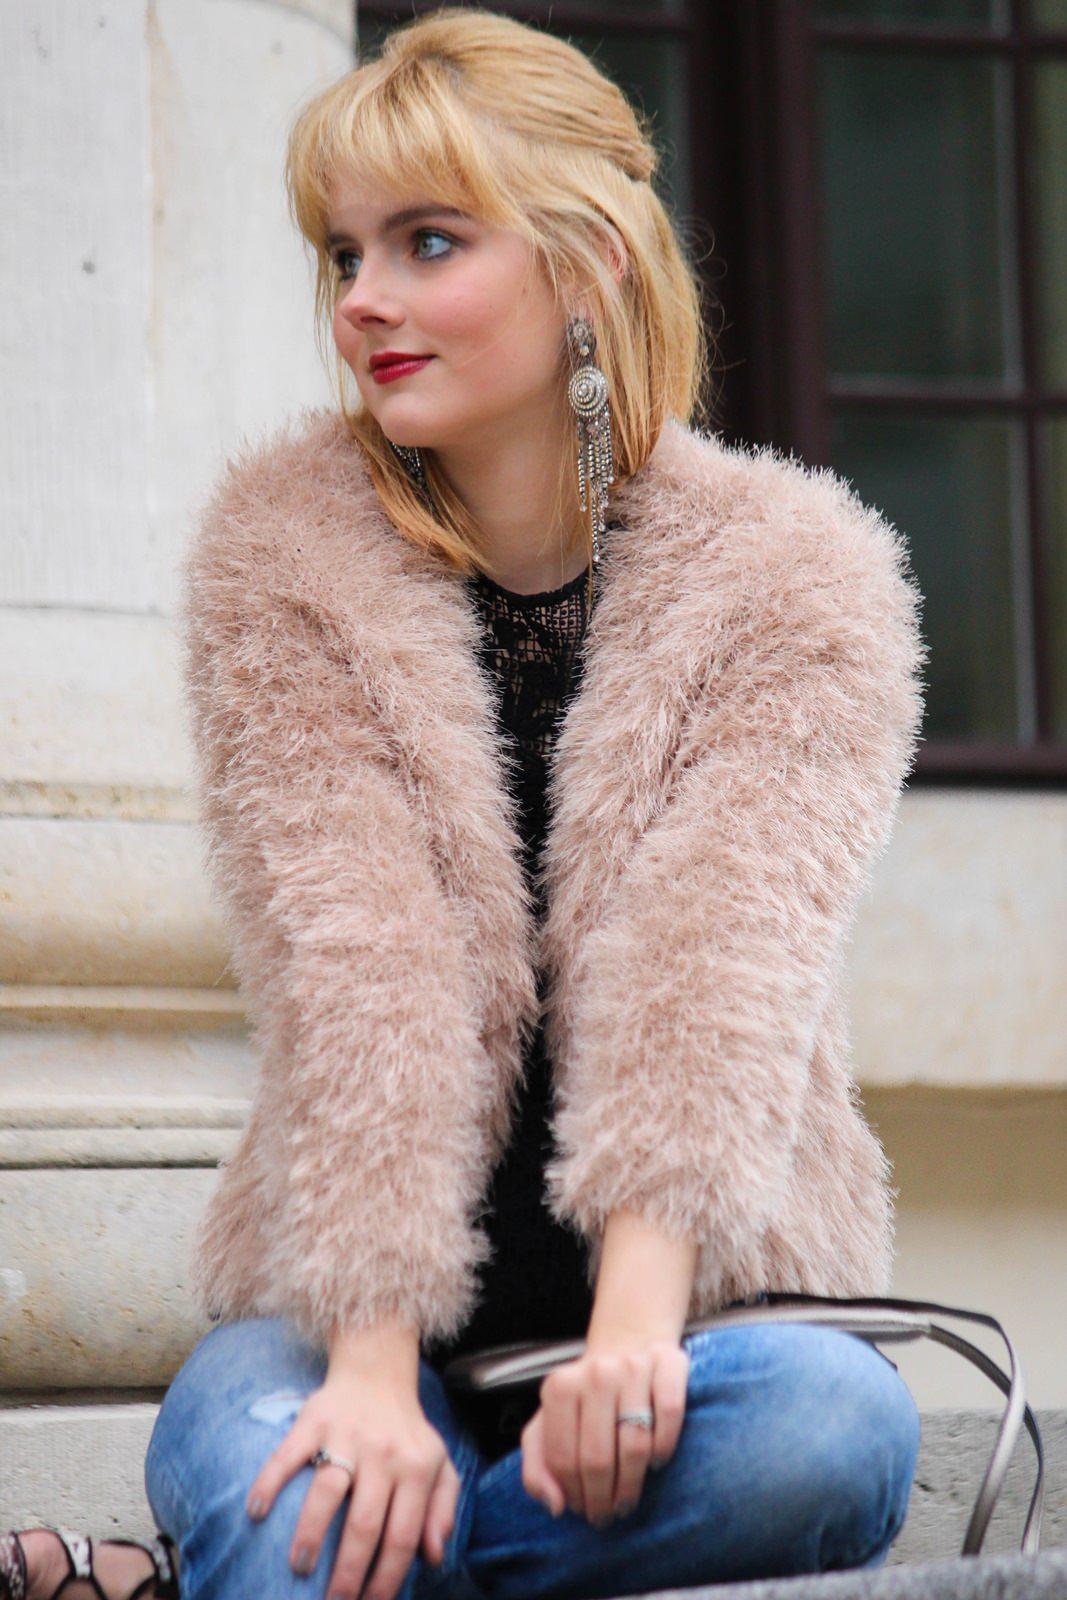 Des Belles Choses - Spot on snake print - Boyfriendjeans, fluffy jacket 8